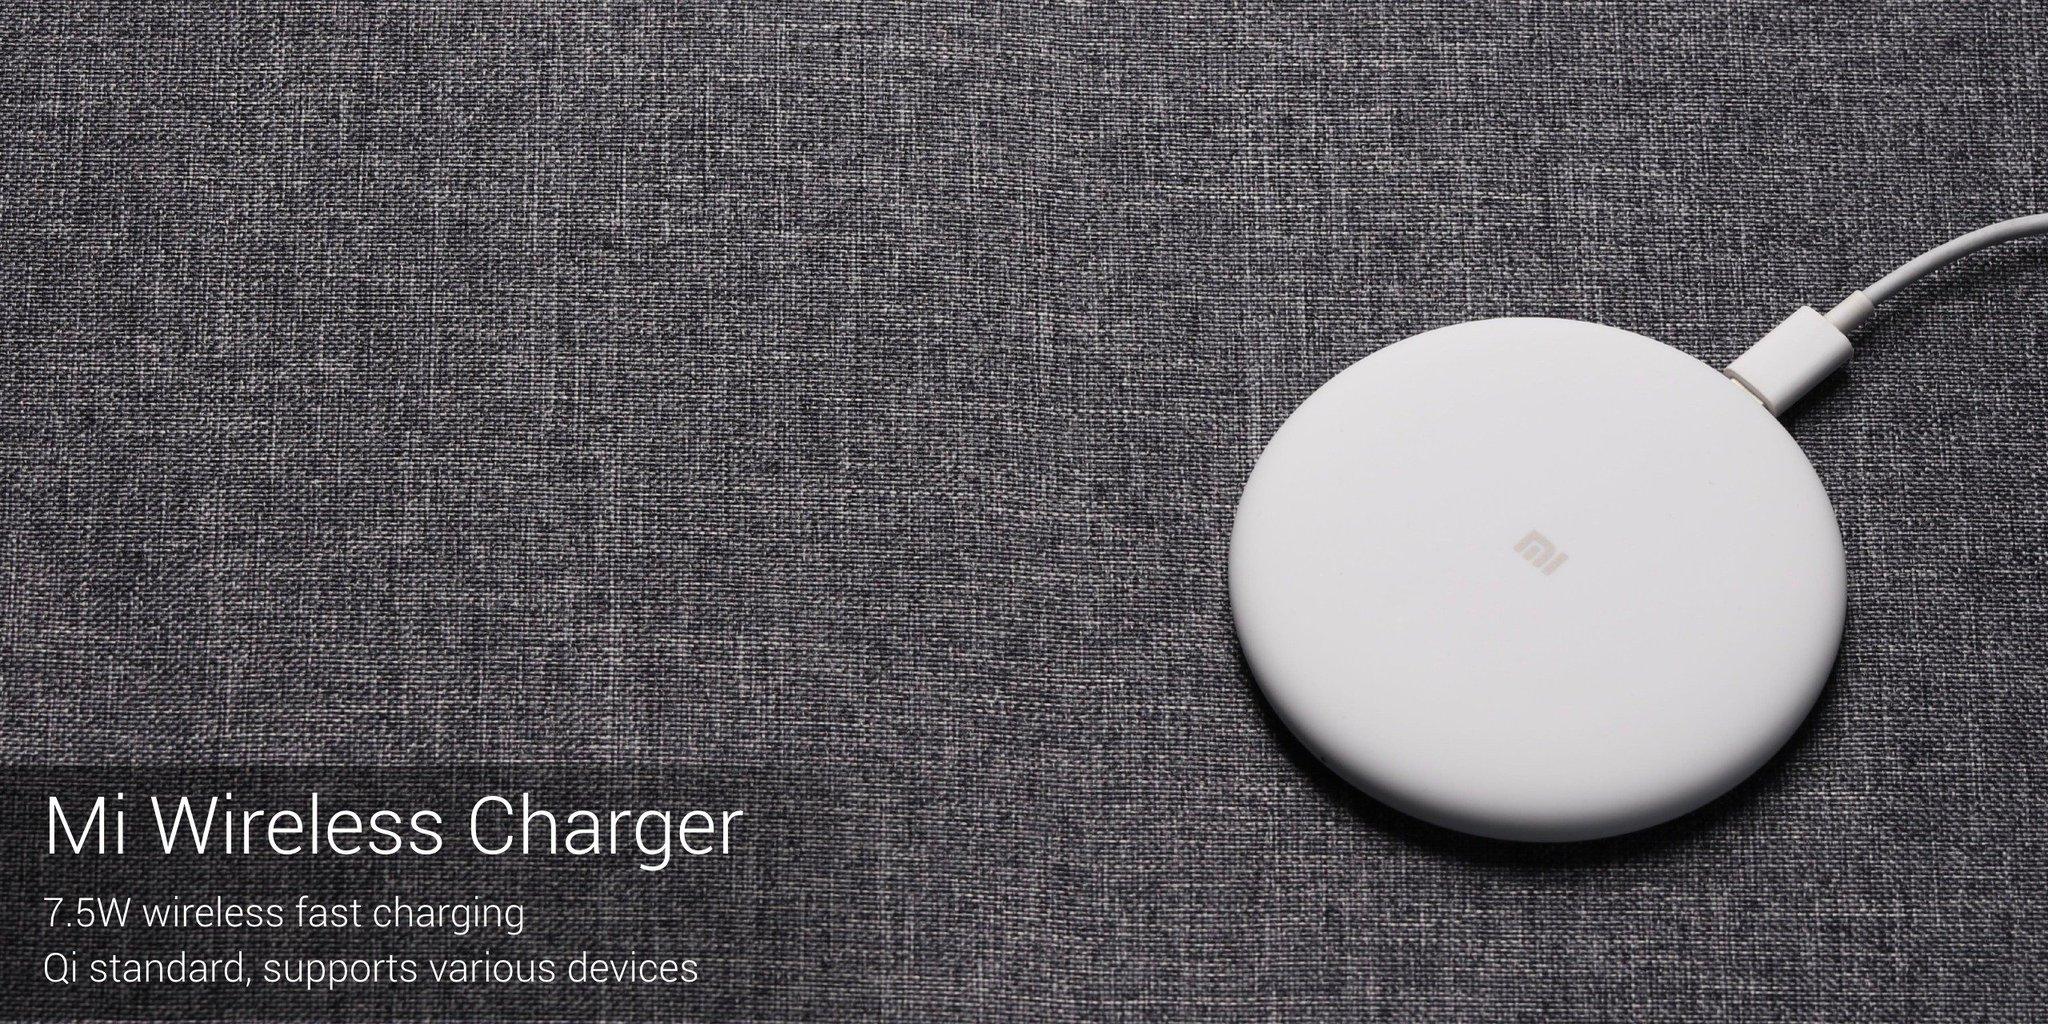 Xiaomi  #MiMIX2S Wireless Charger! mi